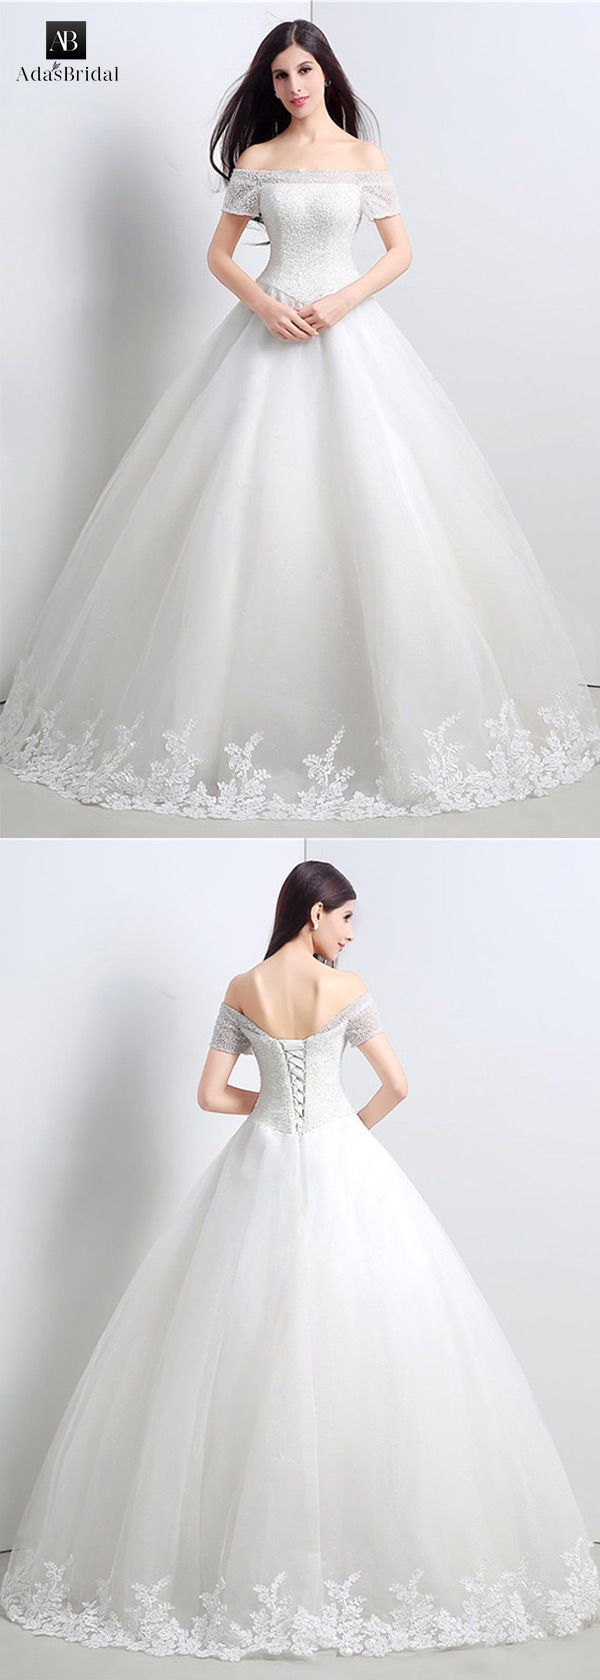 Best 25 wedding dress display ideas on pinterest for Rami kadi wedding dresses prices